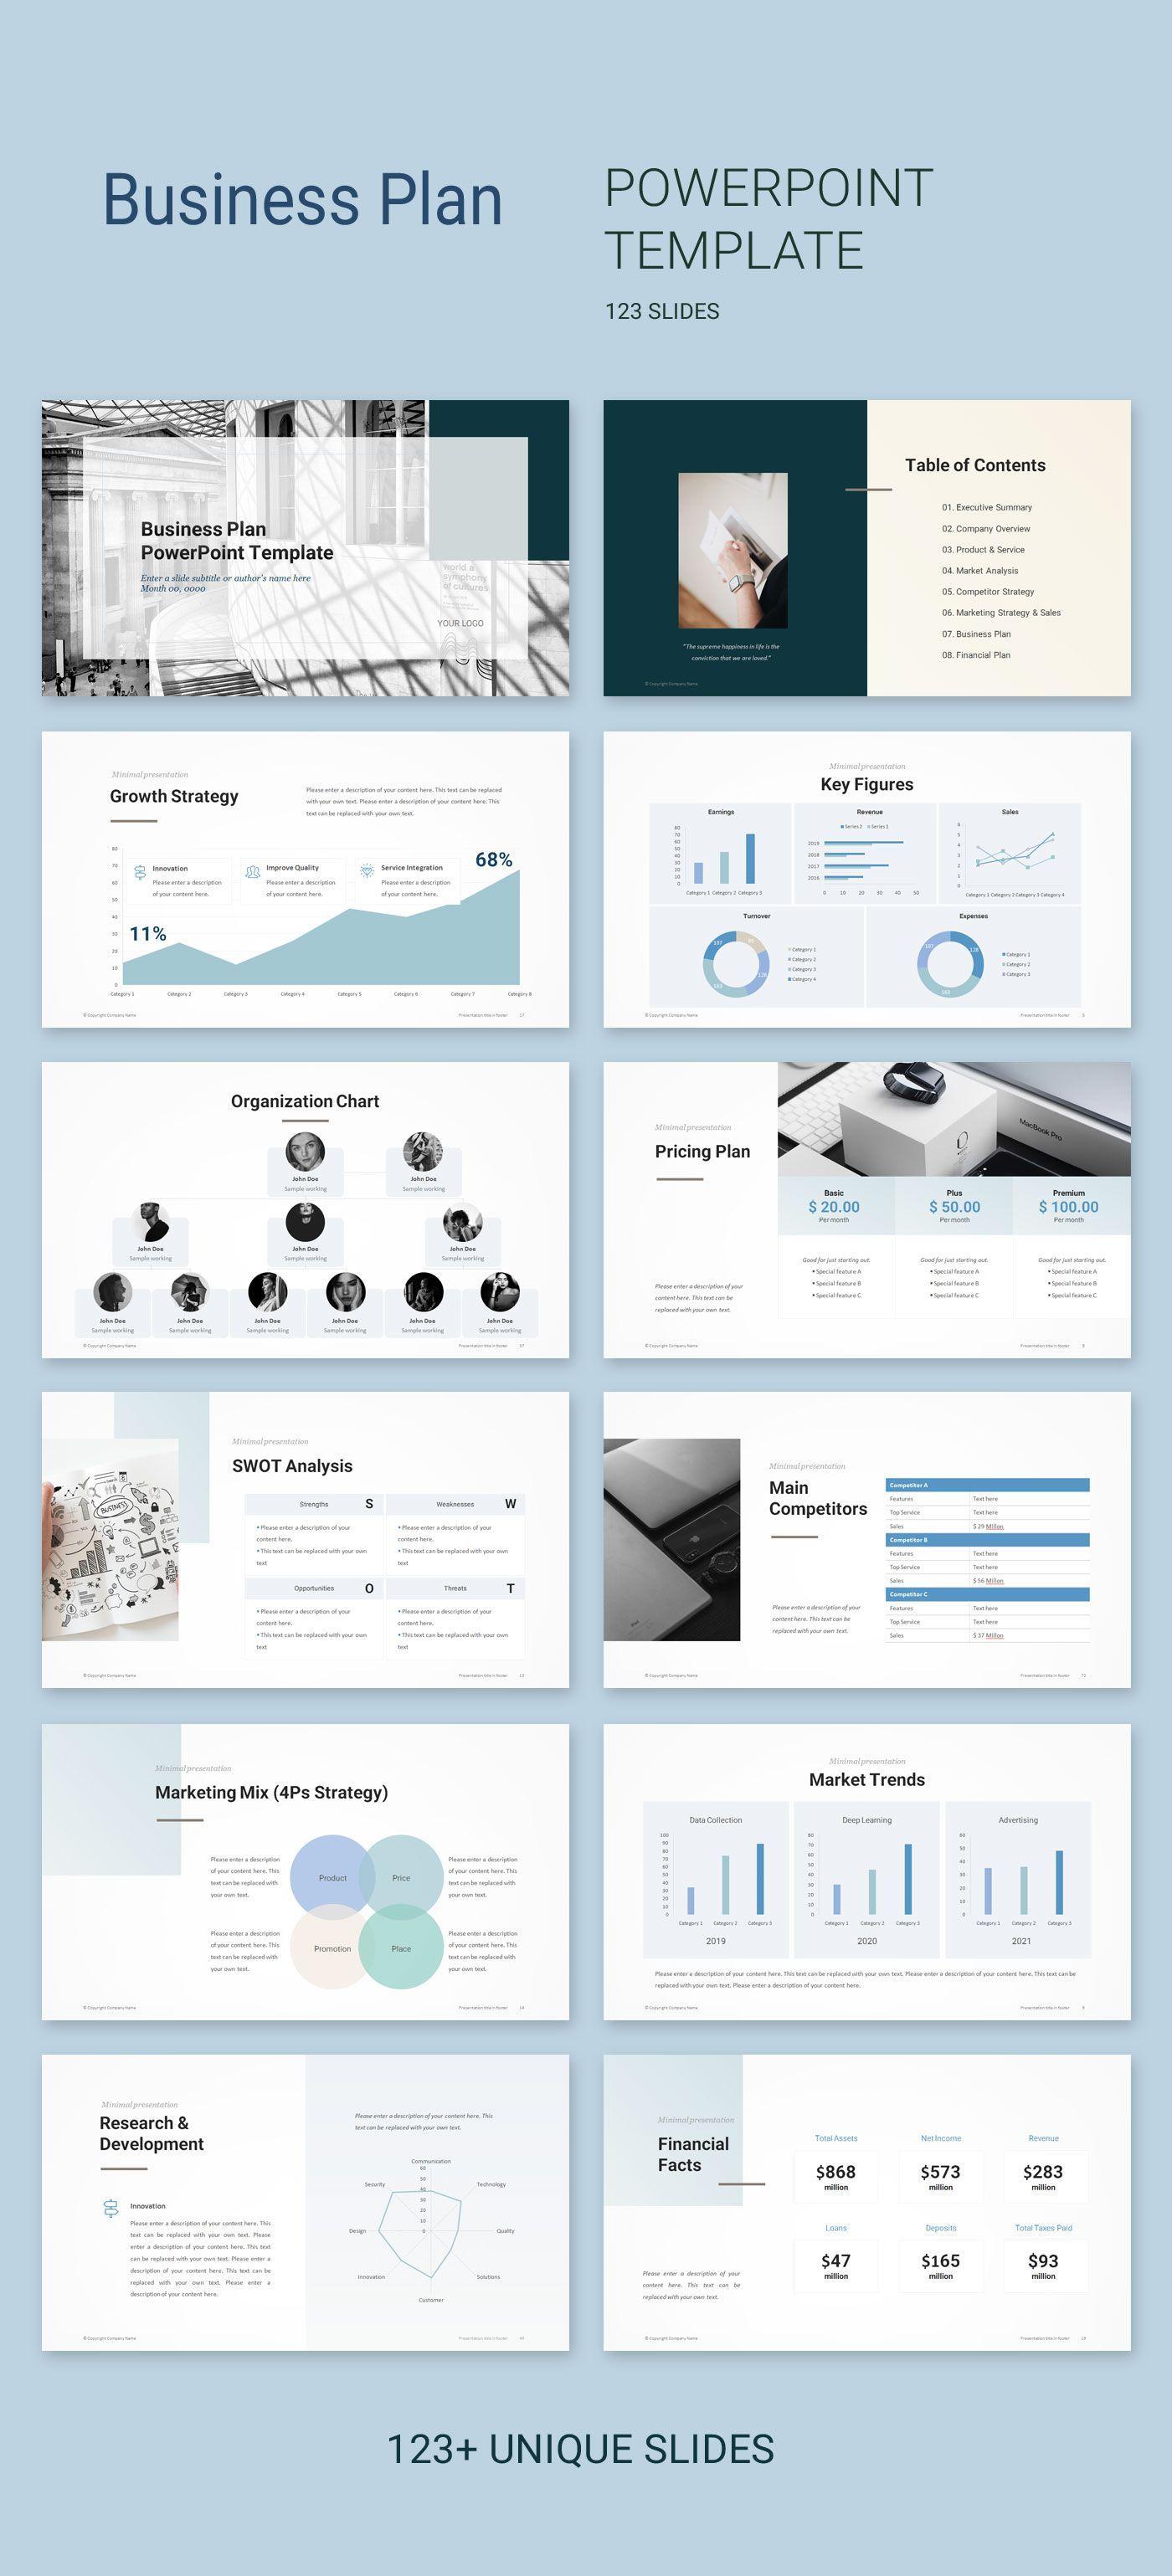 Business Plan Powerpoint Template 2019 Business Plan Ideas Of Tips O Business Plan Presentation Business Powerpoint Presentation Presentation Slides Design